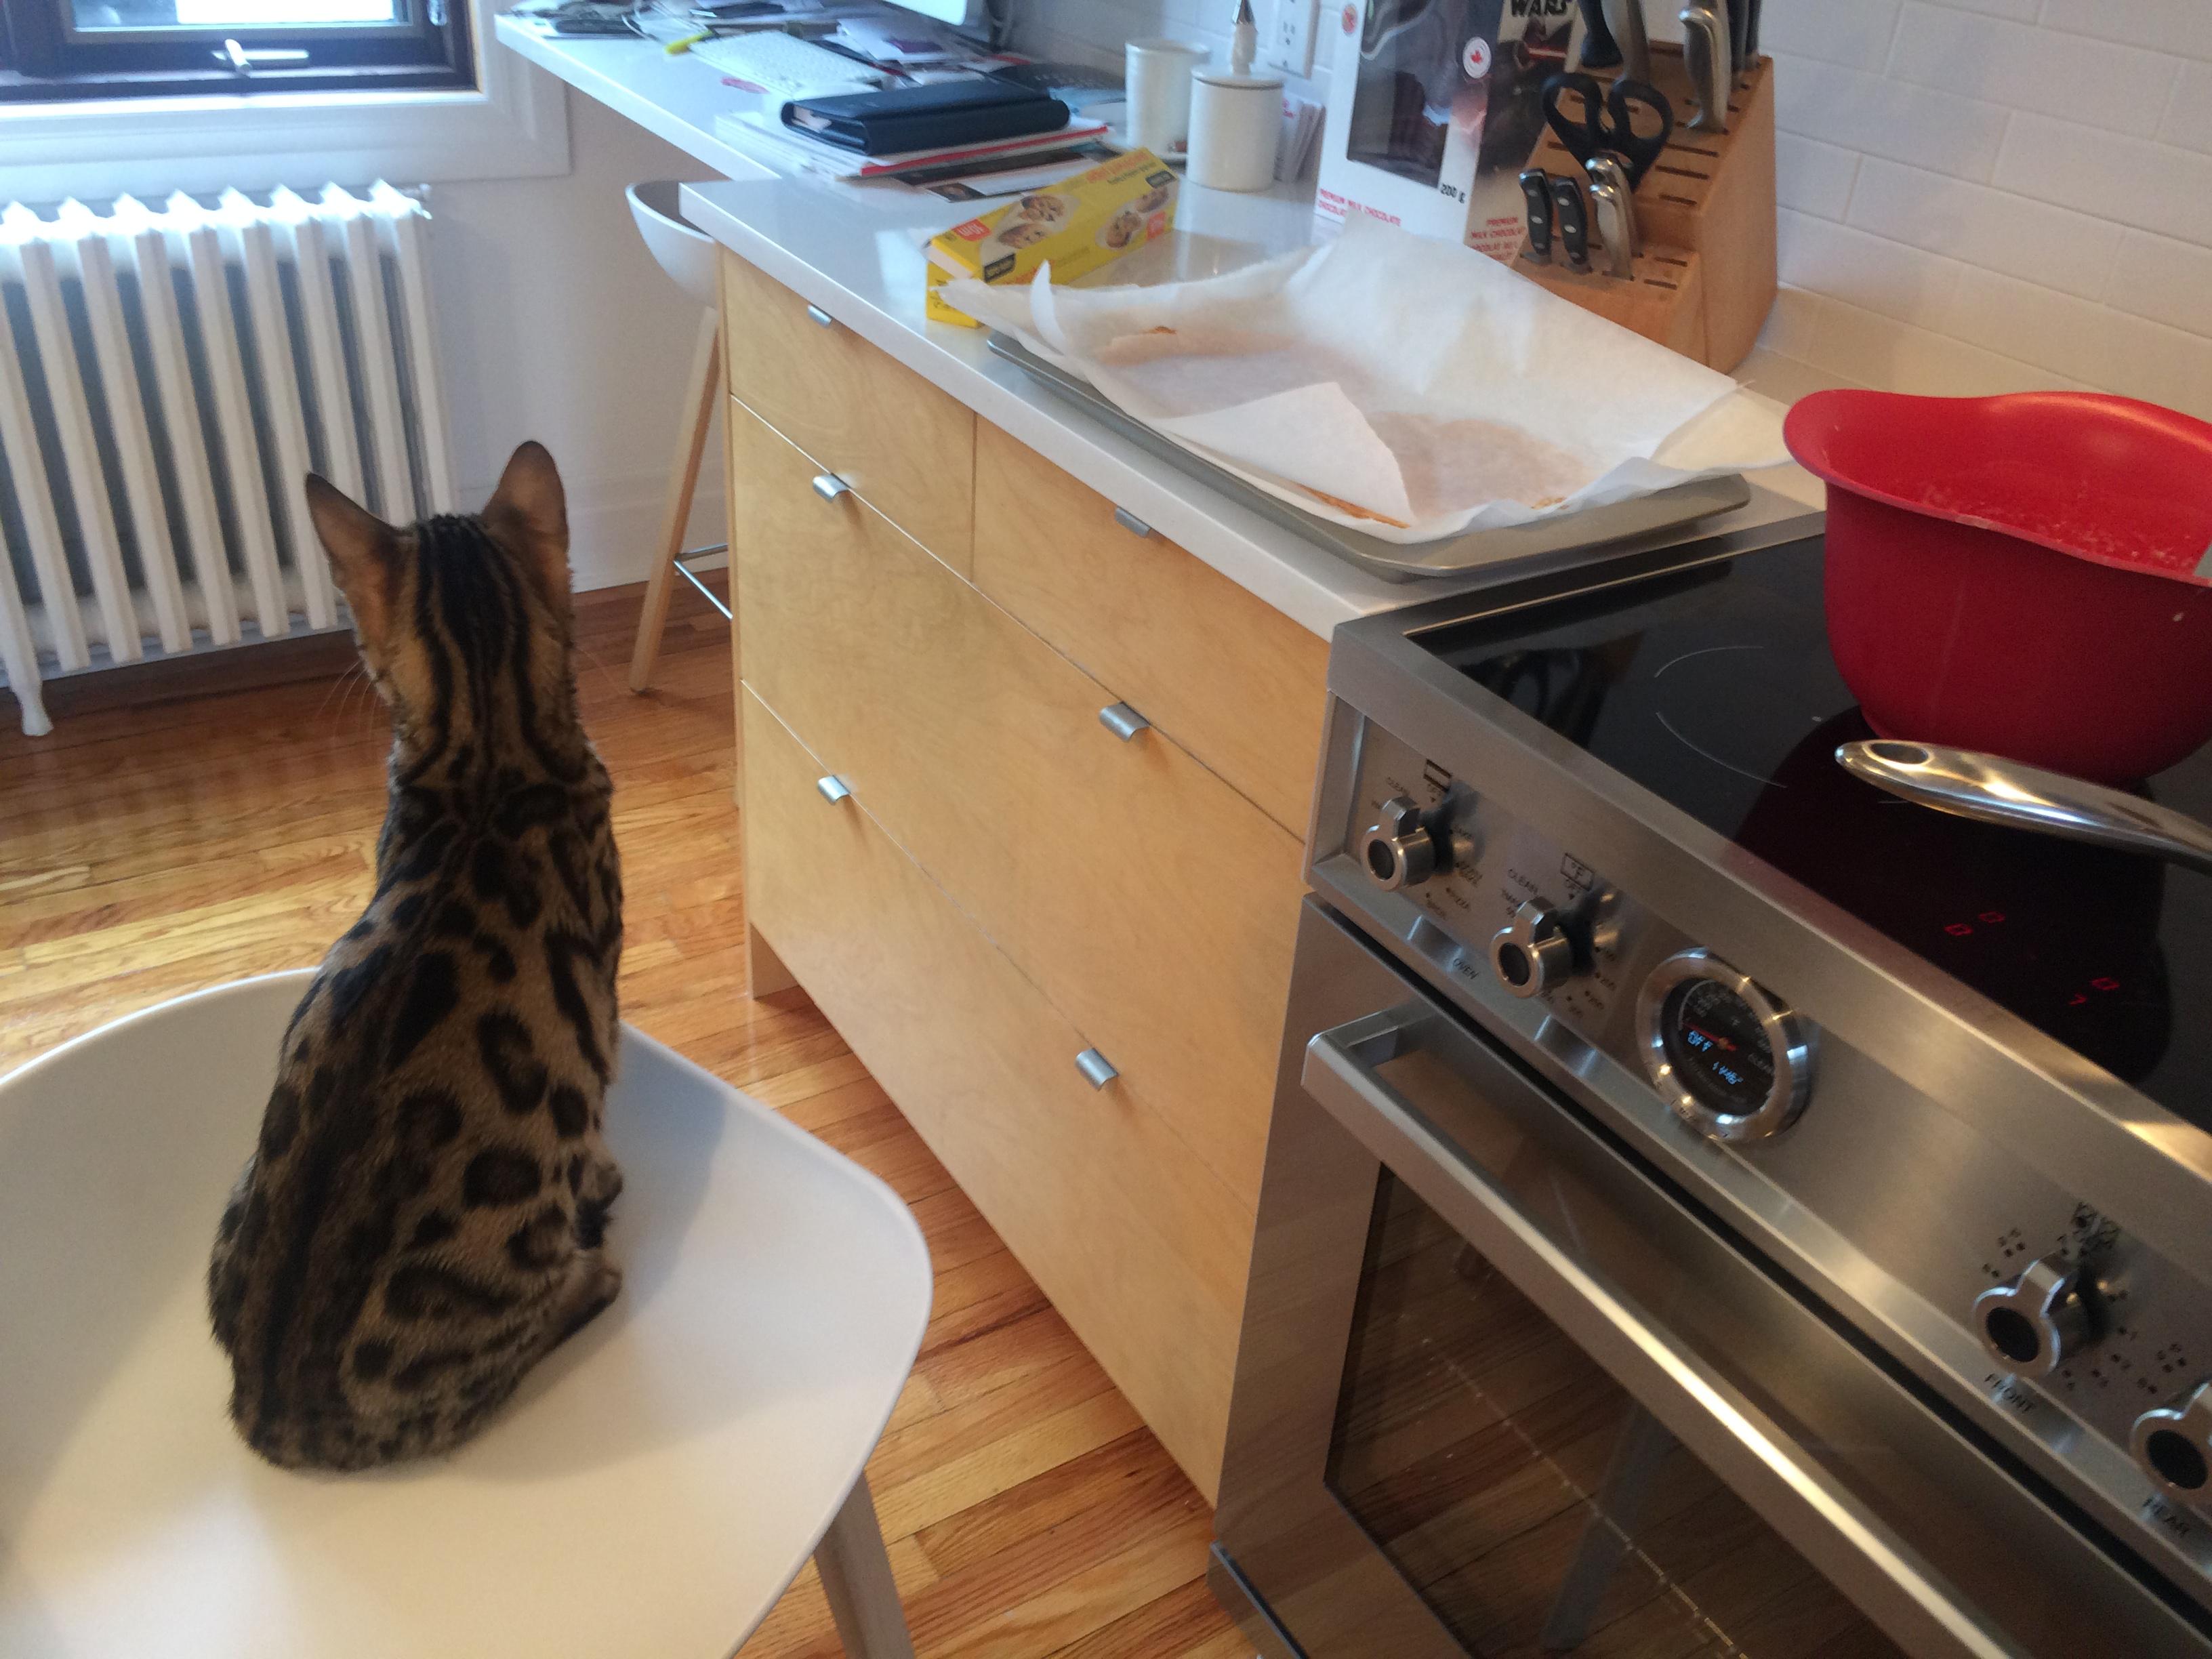 Zorro m'assiste quand je cuisine